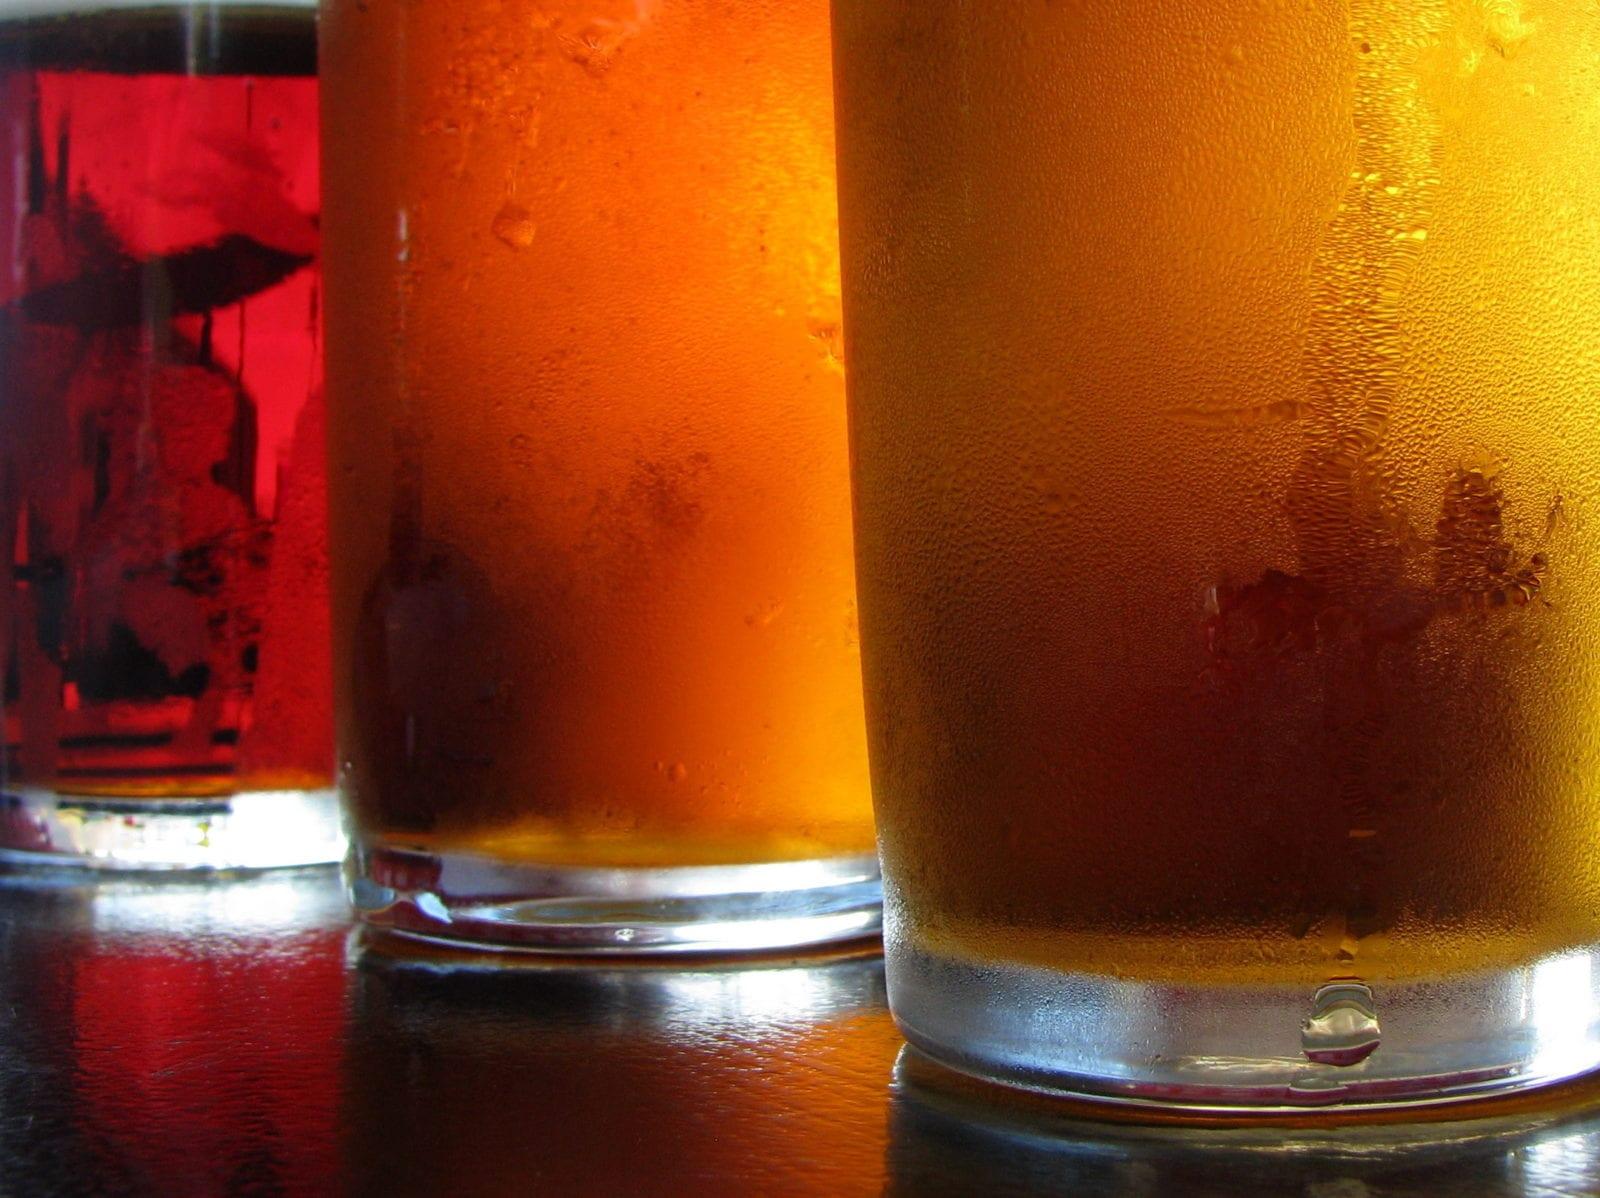 Bellingham, Beer Week, Whatcom County, Craft beer, Boundary Bay, Chuckanut Brewery, Kulshan Brewing Company